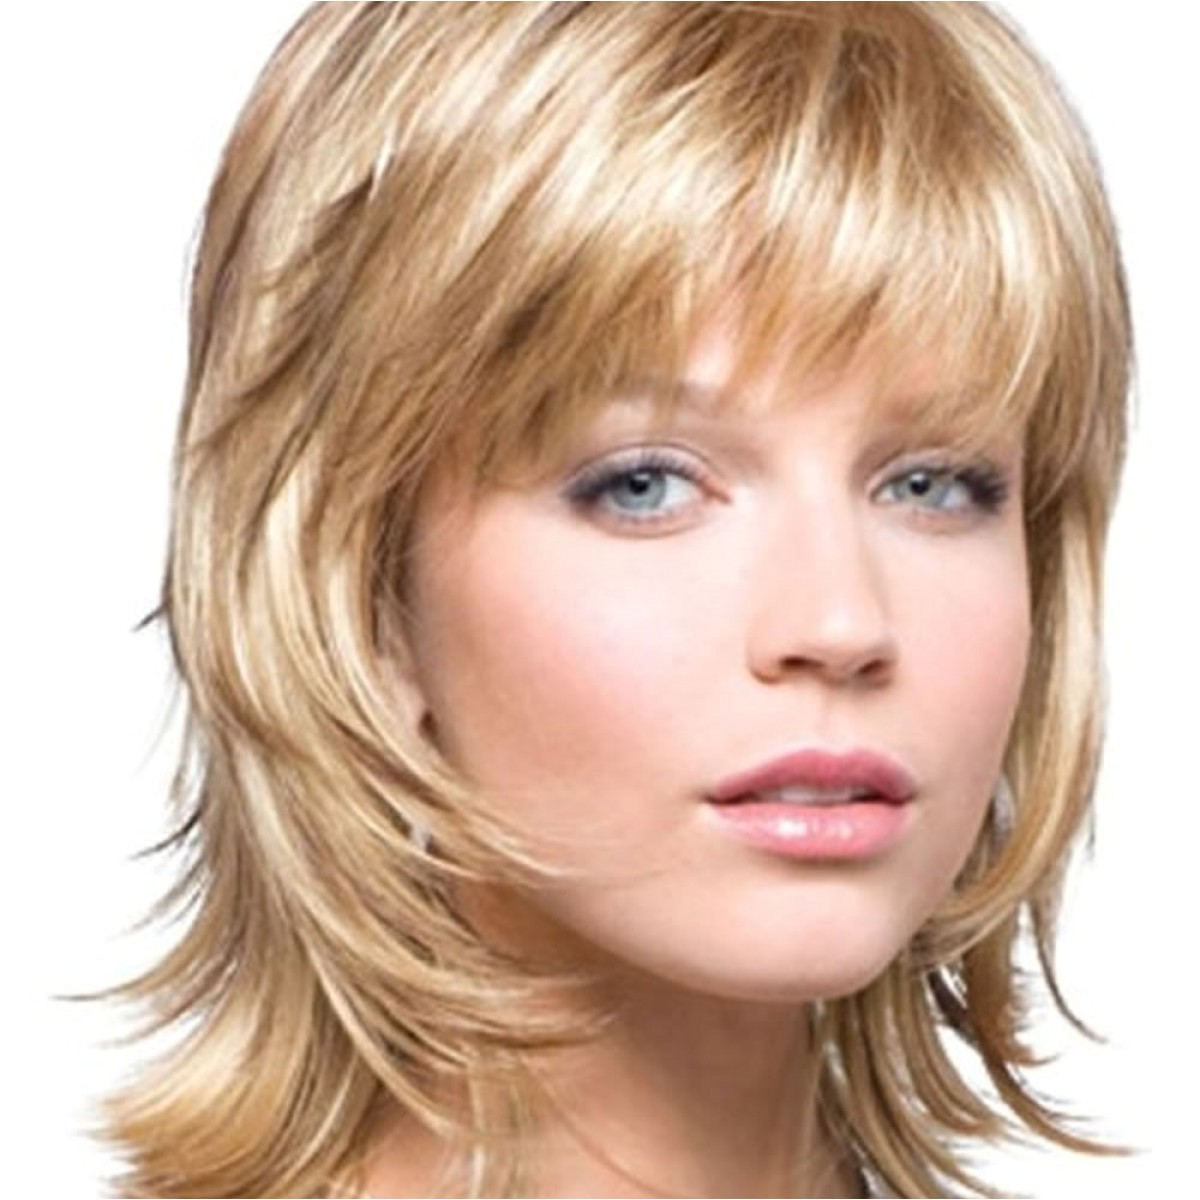 Medium Length Hairstyles for Fine Hair 2018 Medium Length Hairstyles for Fine Hair 2018